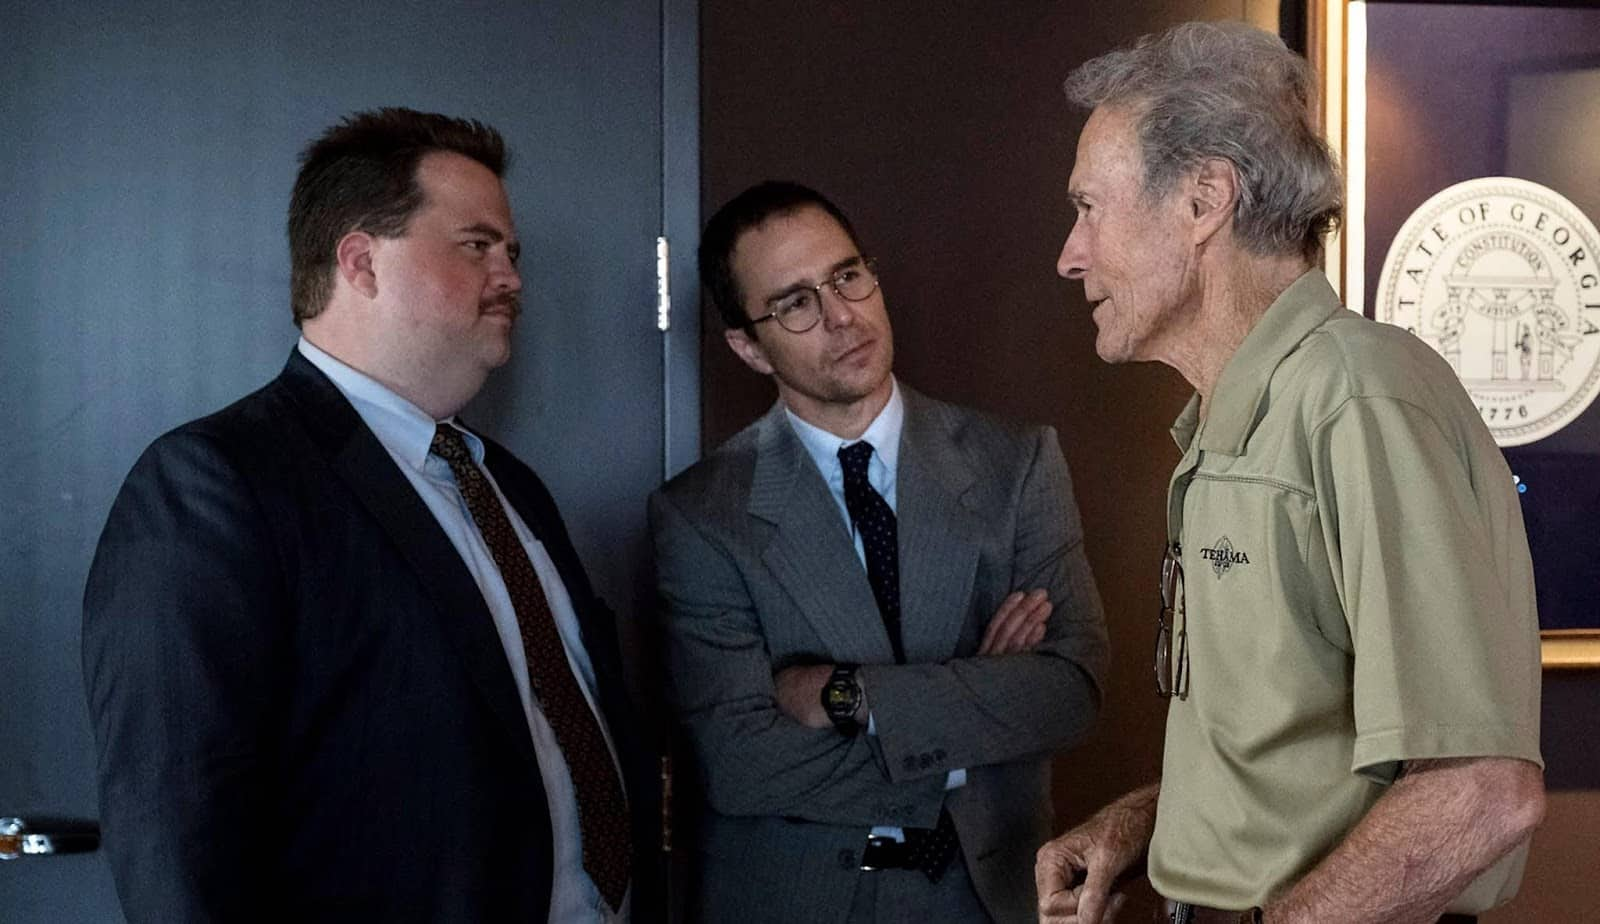 Sul set di Richard con Clint Eastwood, Sam Rockwell e Paul Walter Hauser